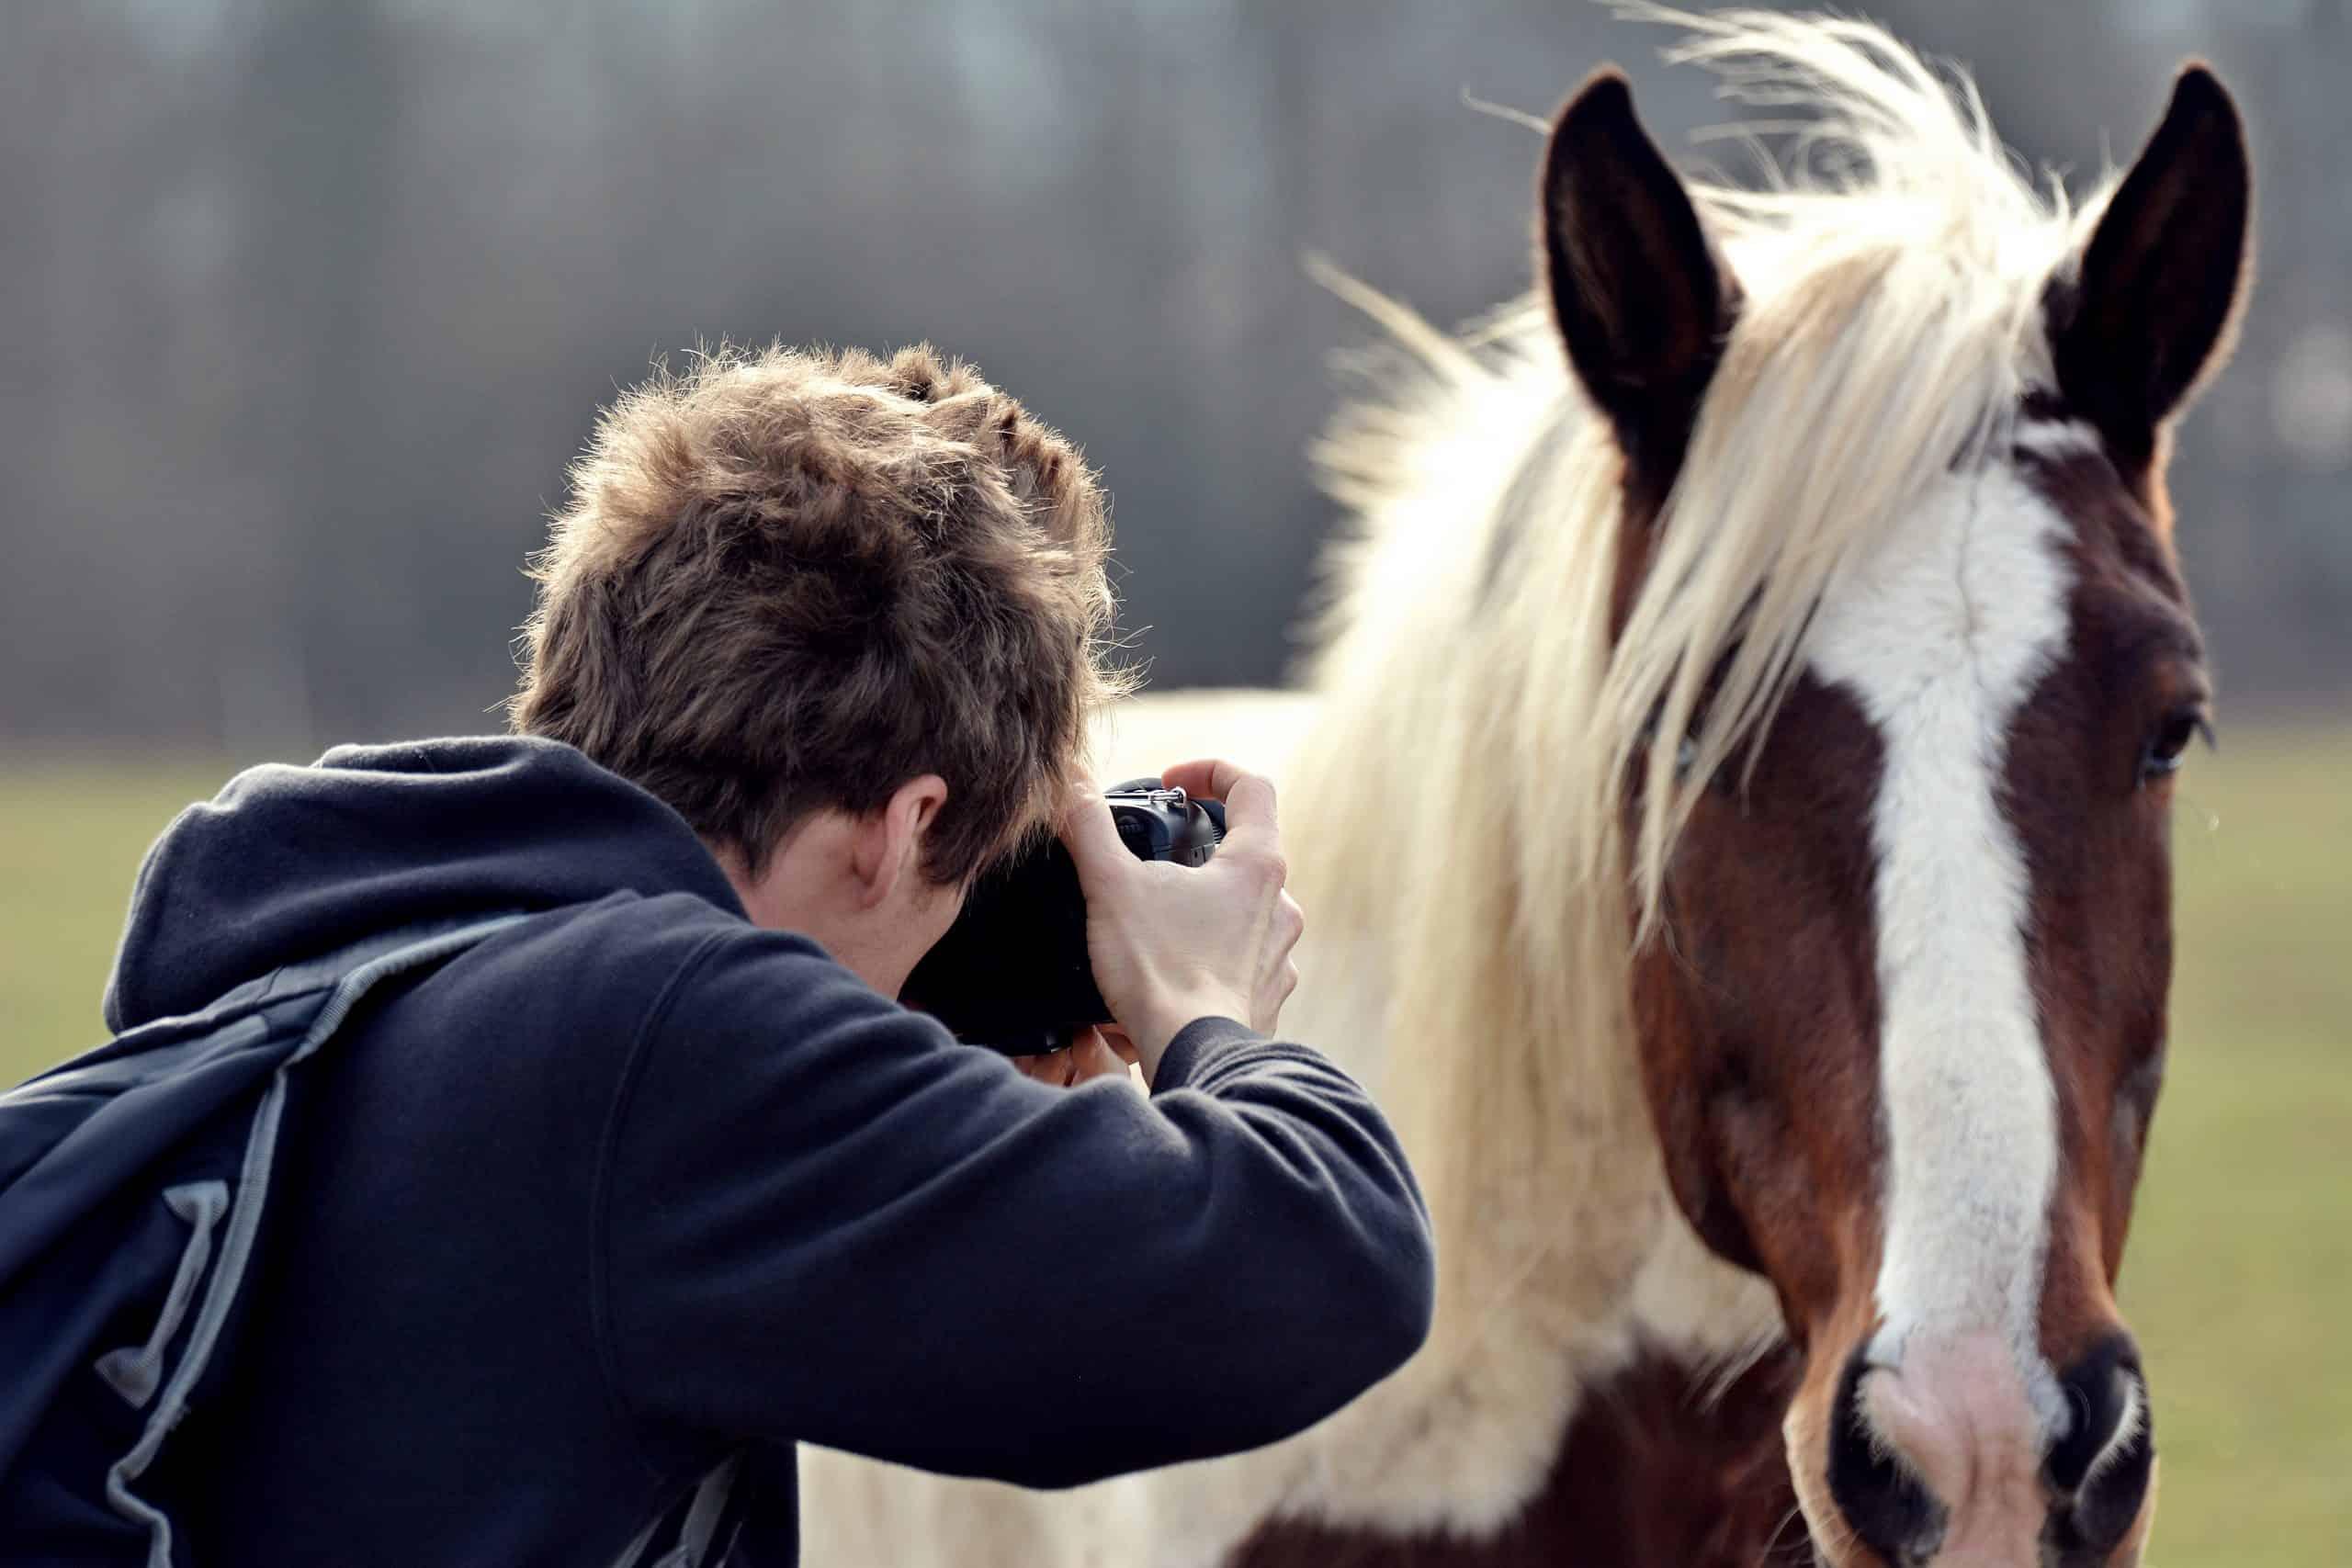 Horse Riding Photo Shoot Ideas For Equestrians